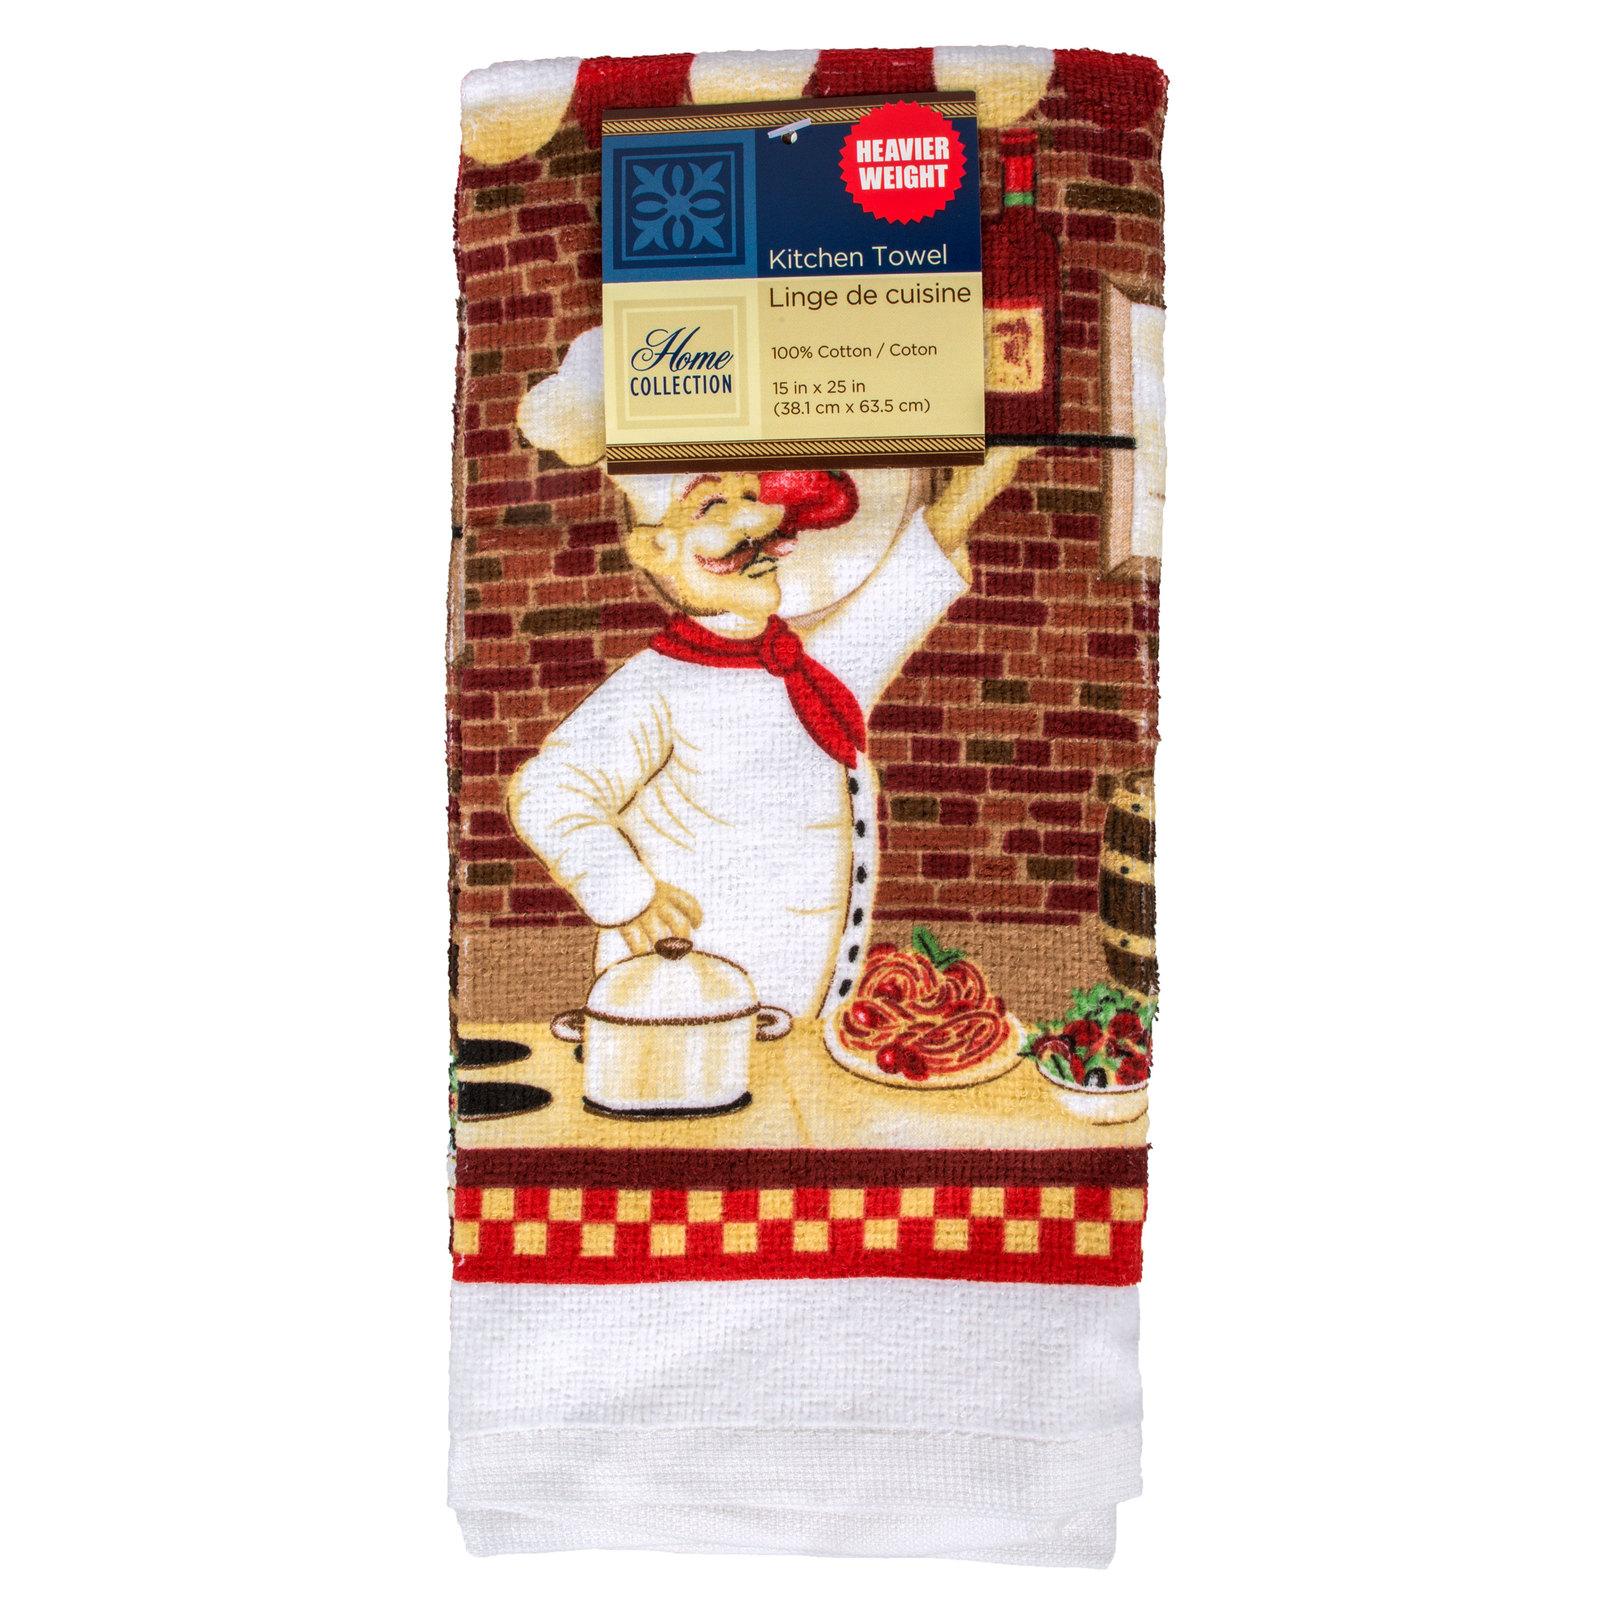 RED WINE FAT CHEF KITCHEN LINEN SET 10pc Placemats Towels Potholders Cloths NEW